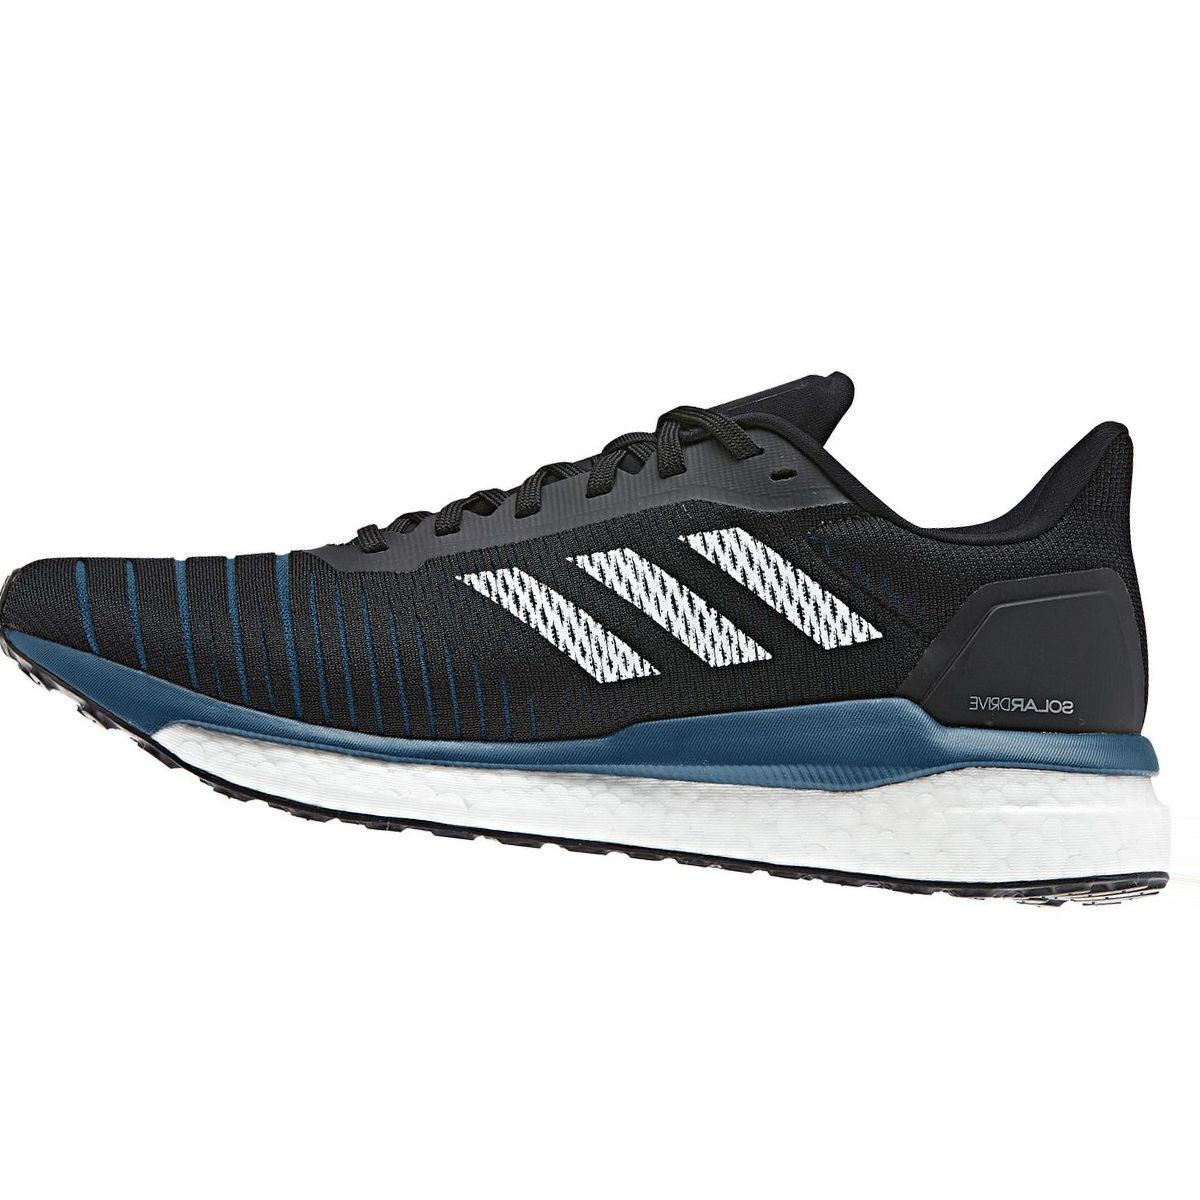 Adidas Solar Drive Running Shoe - Men's